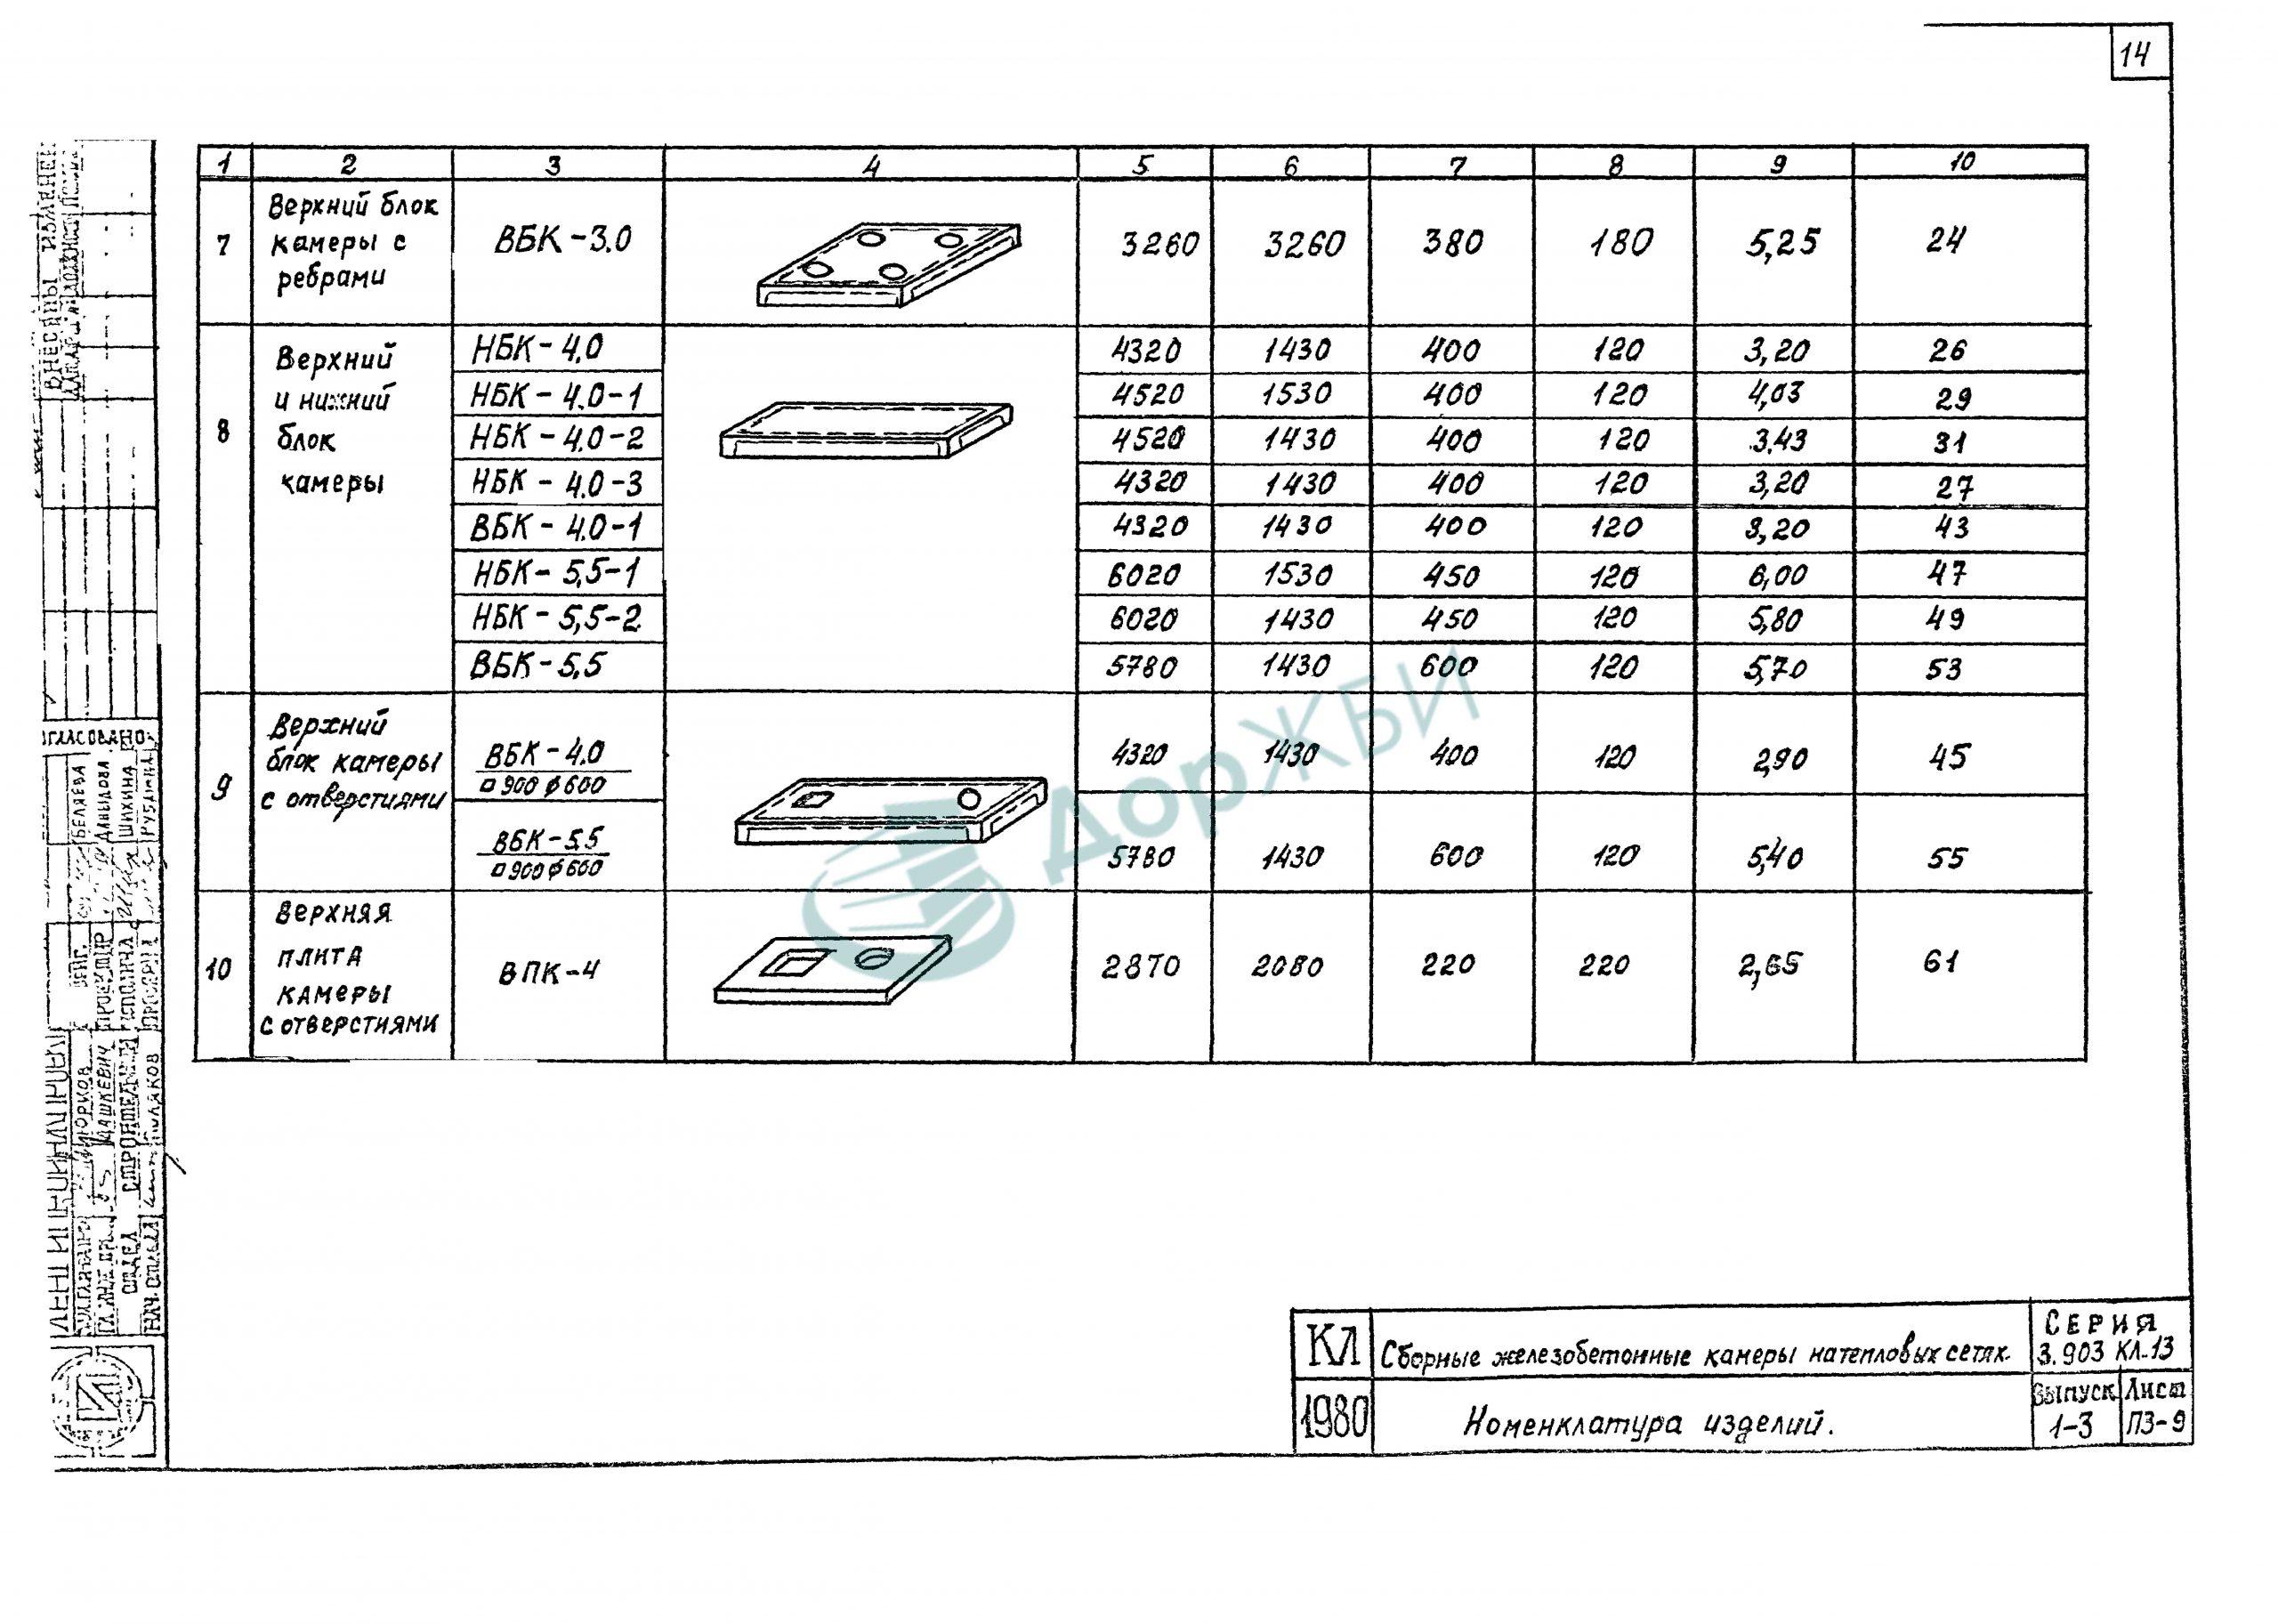 СБК 3.0 2-800х1600